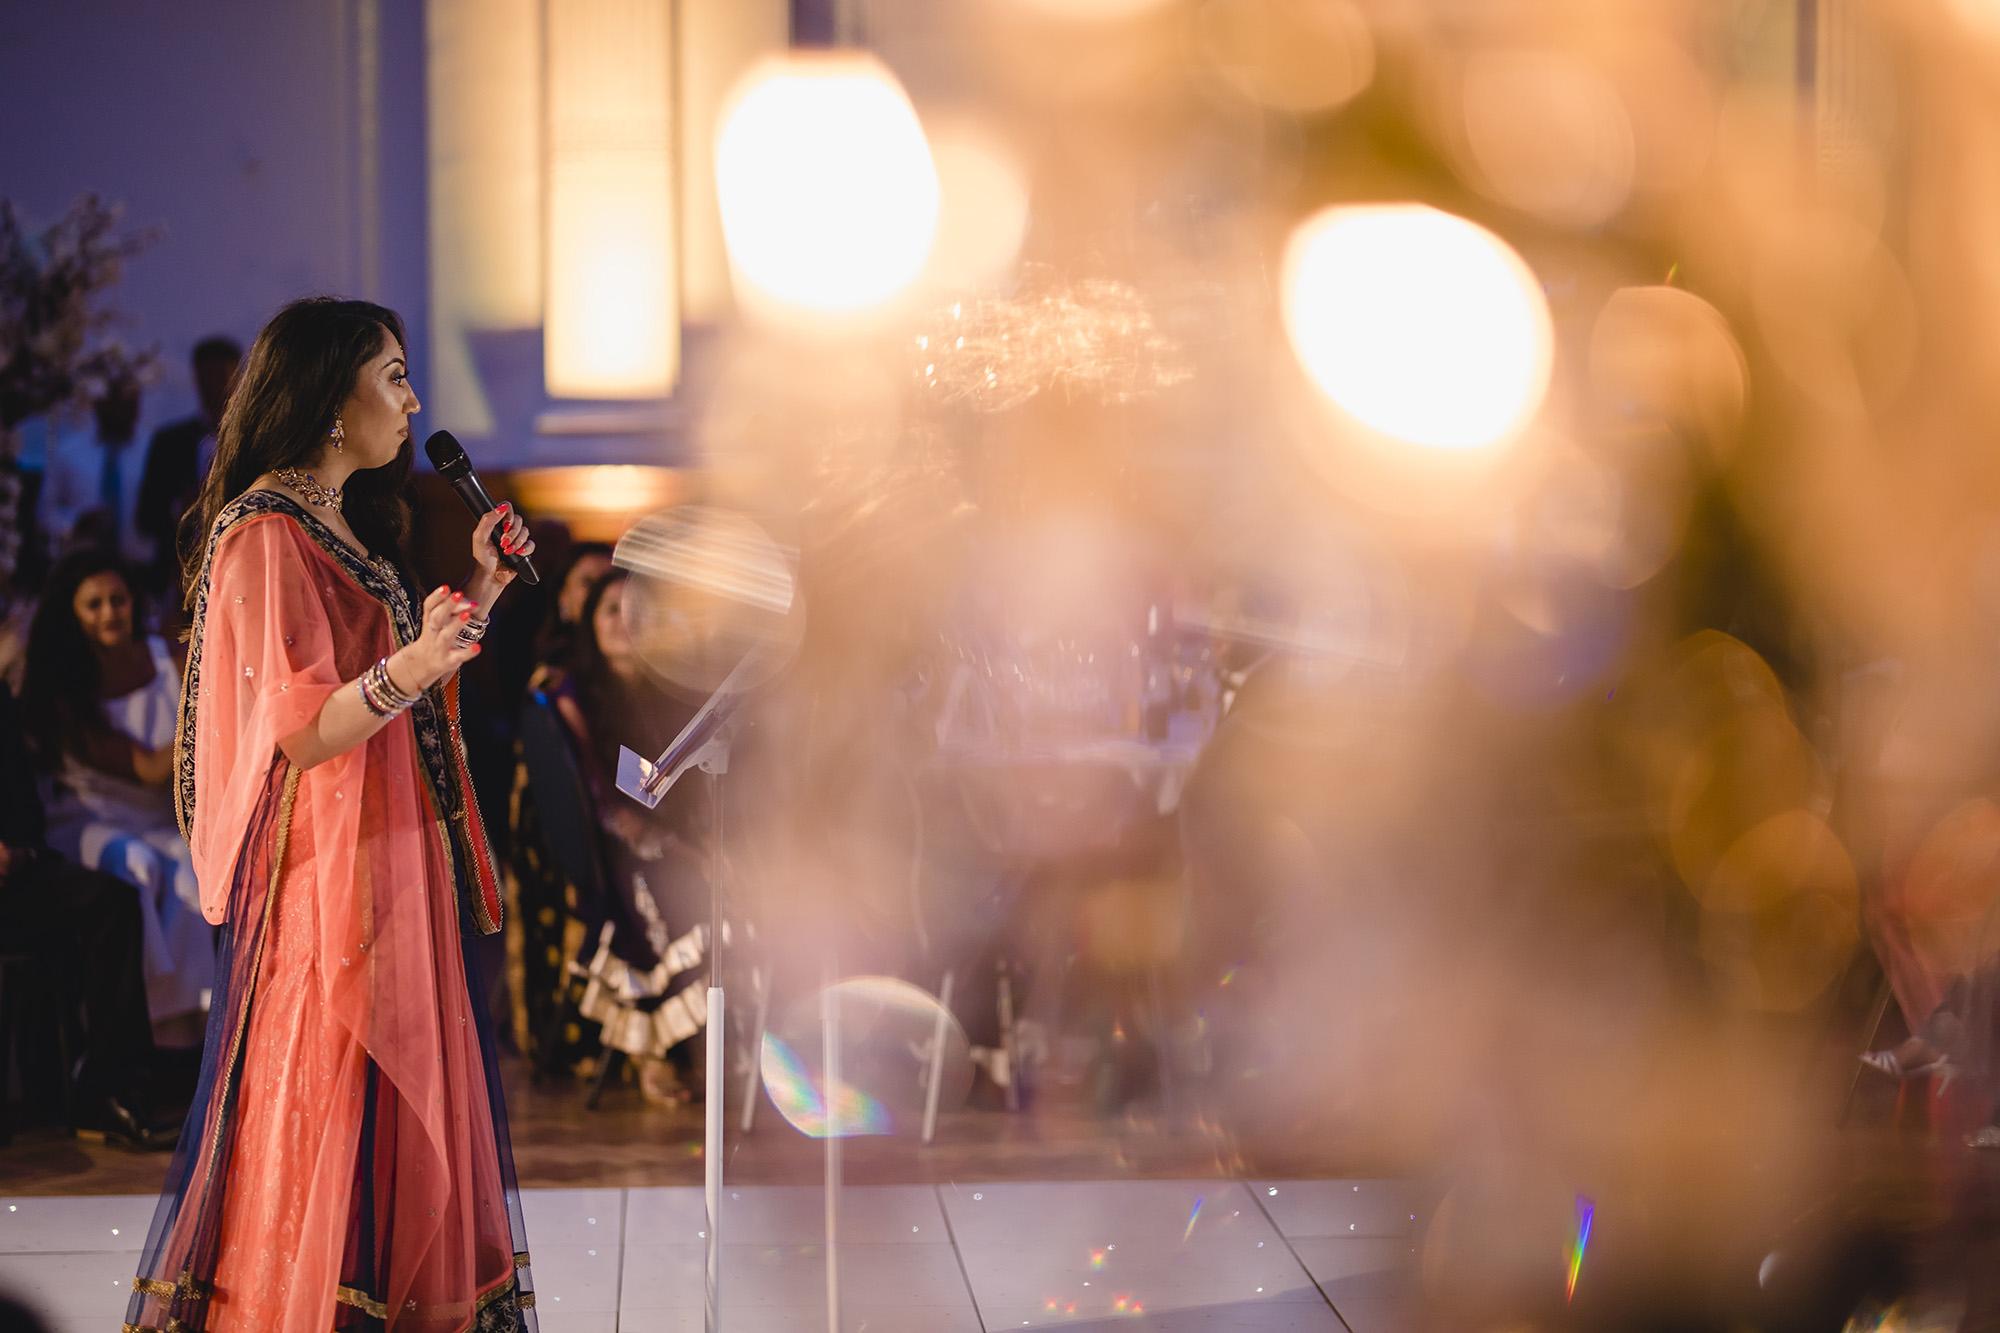 wedding speech by brides friend at RHH